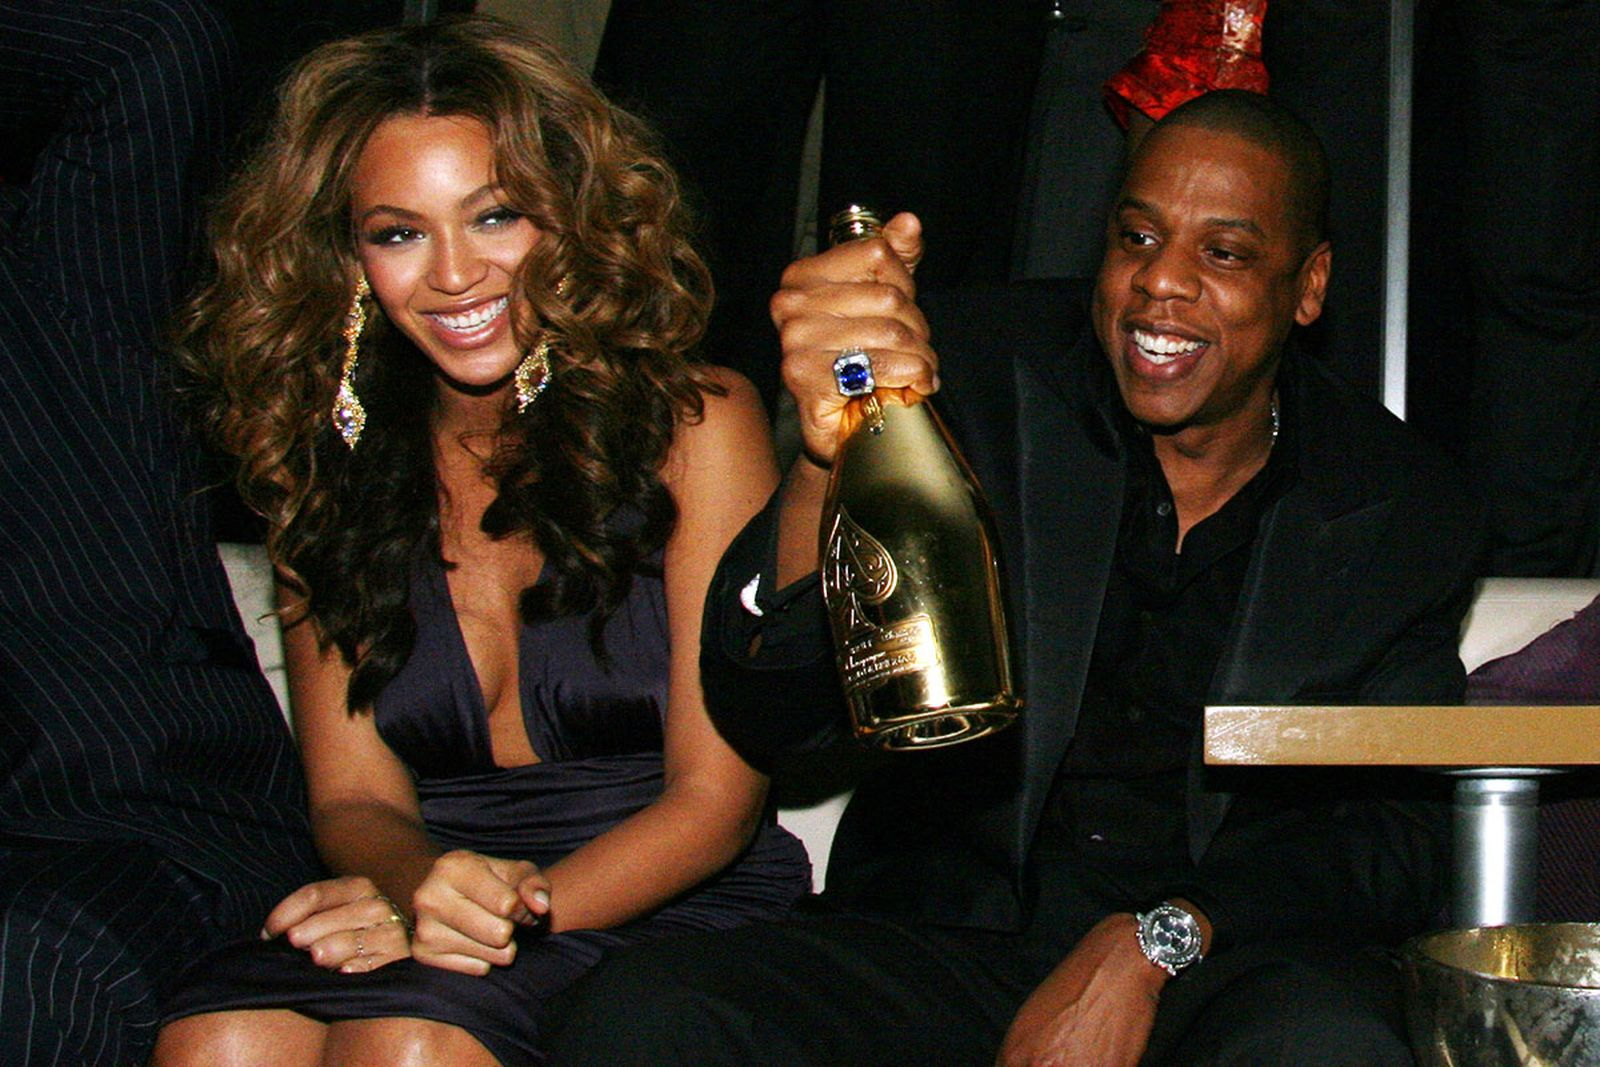 lvmh-jay-z-armand-de-brignac-champagne-main